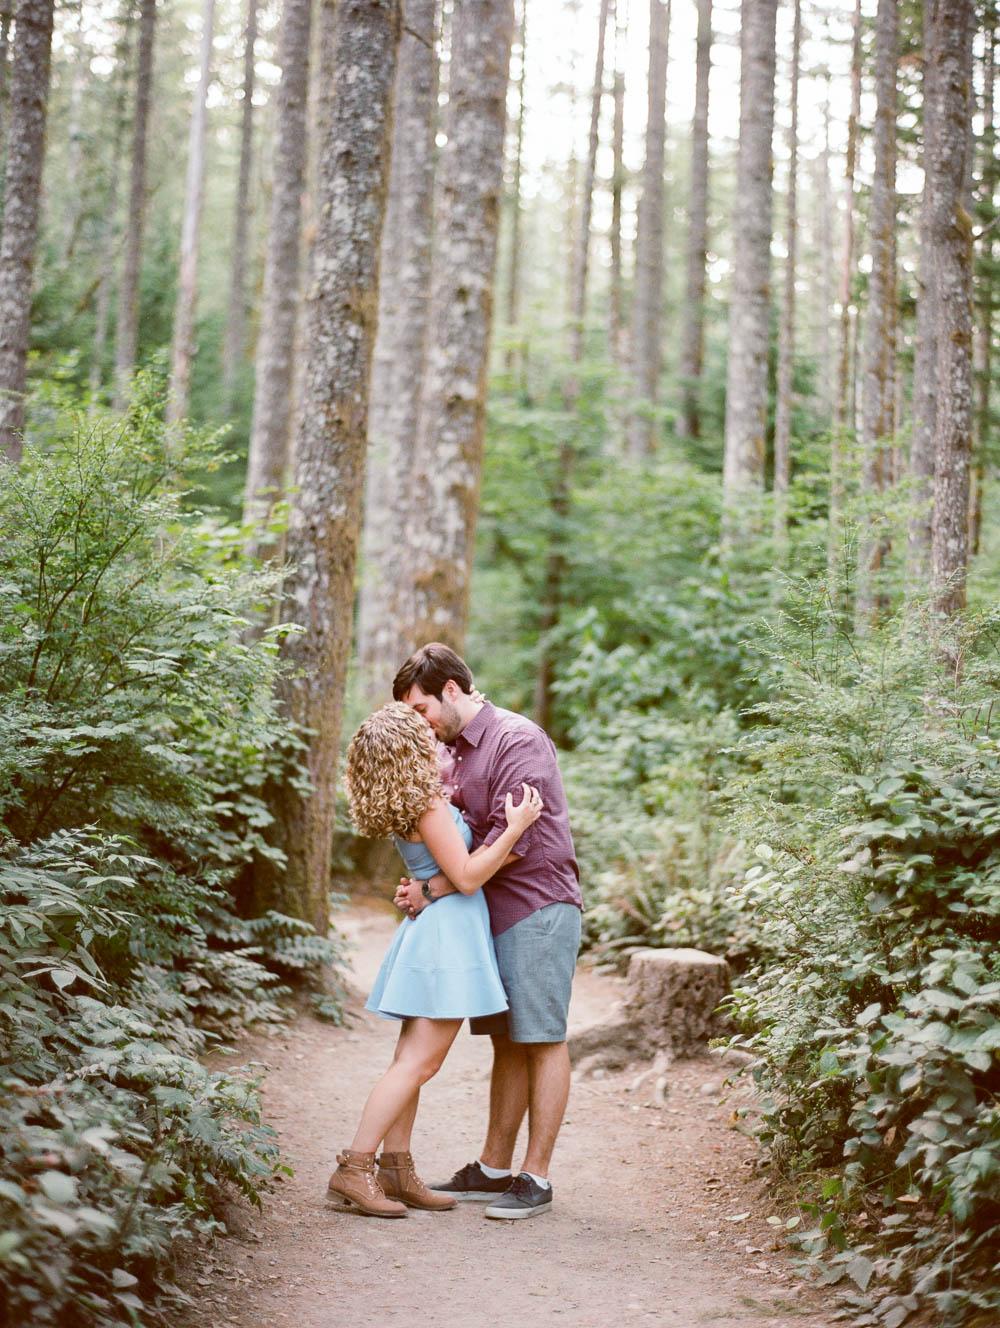 kateweinsteinphoto_marilynquinn_engagement107.jpg